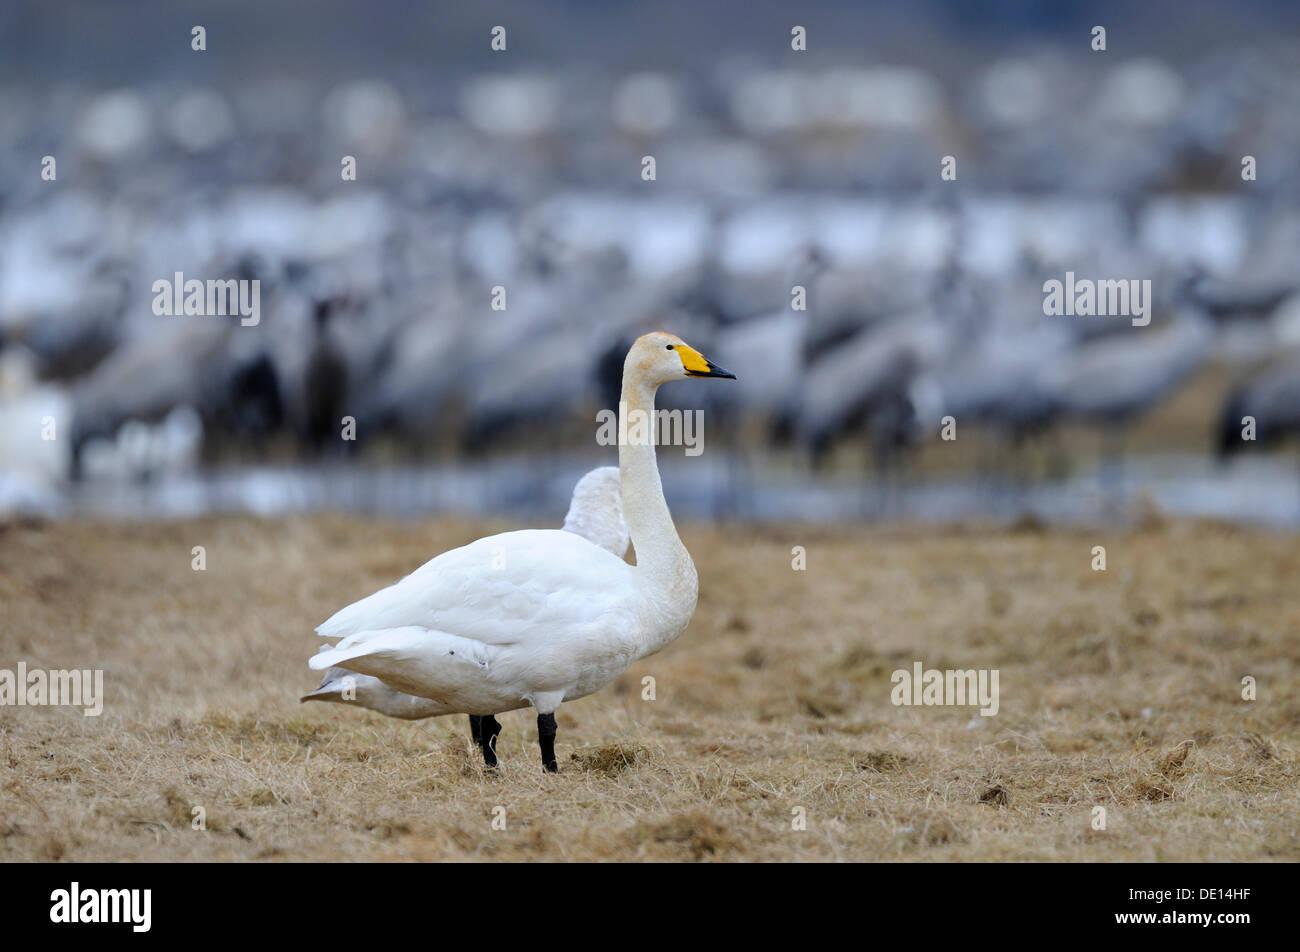 Whooper Swans (Cygnus cygnus) and cranes (Grus grus), rest area, Hornborgasjoen, Vaestergoetland, Sweden, Scandinavia, Europe - Stock Image